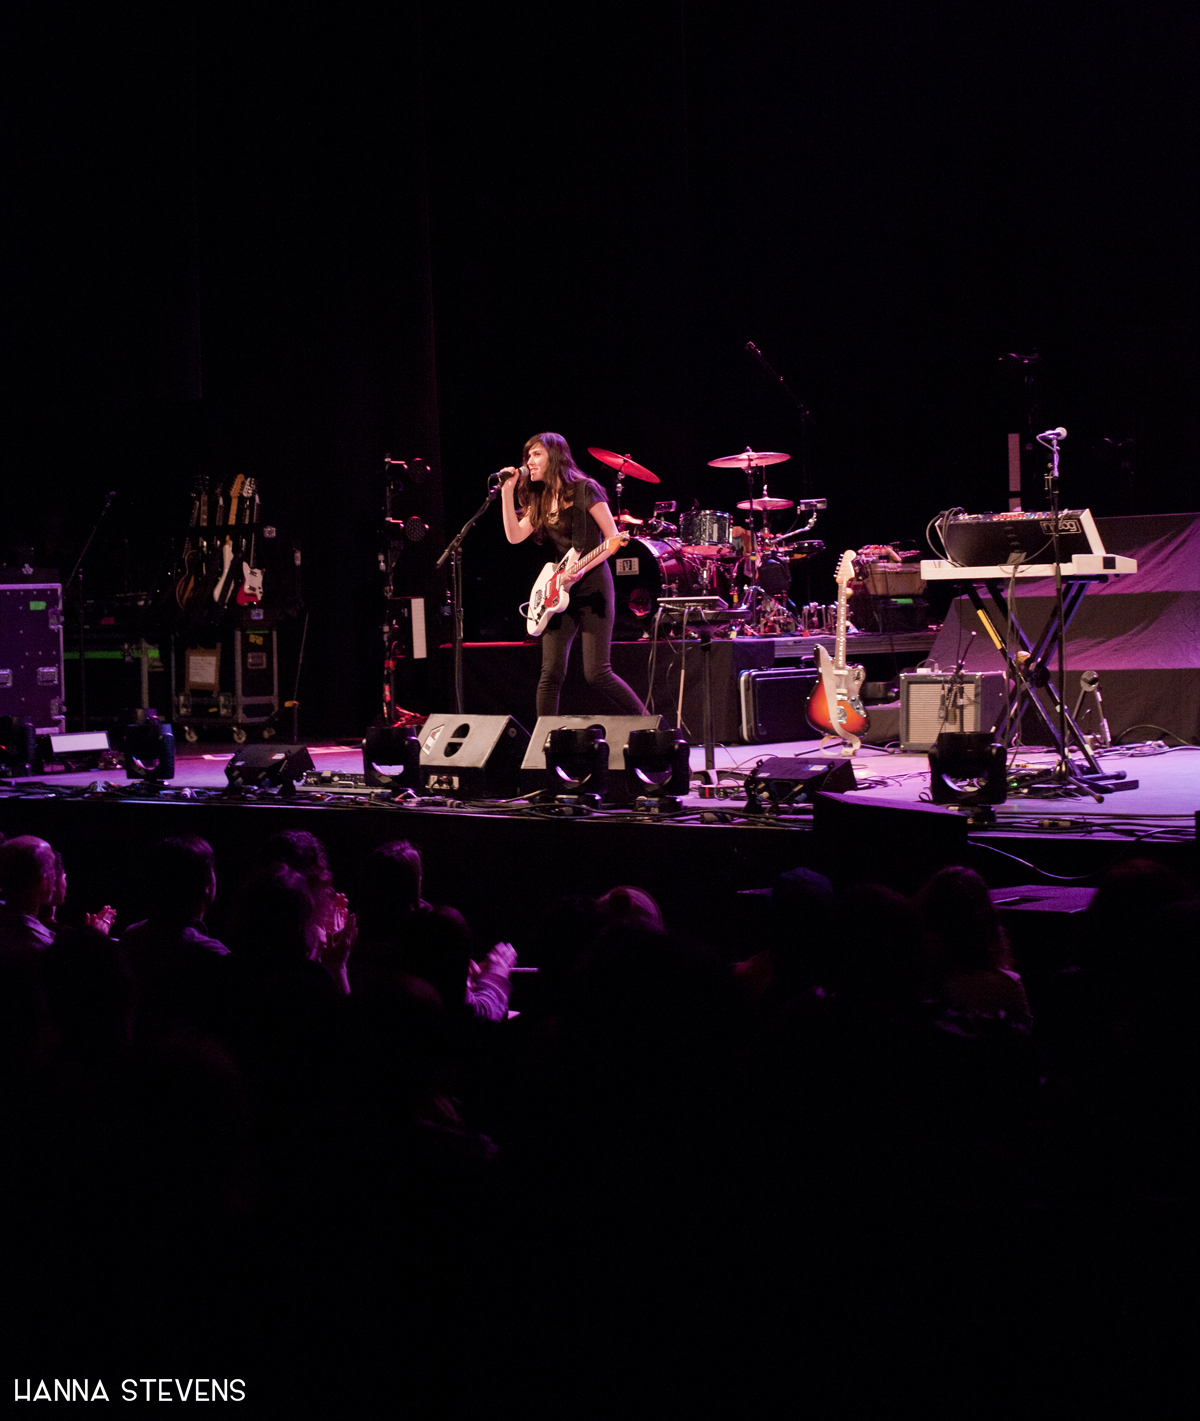 Noveller Live at The Moore (Photo by Hanna Stevens)